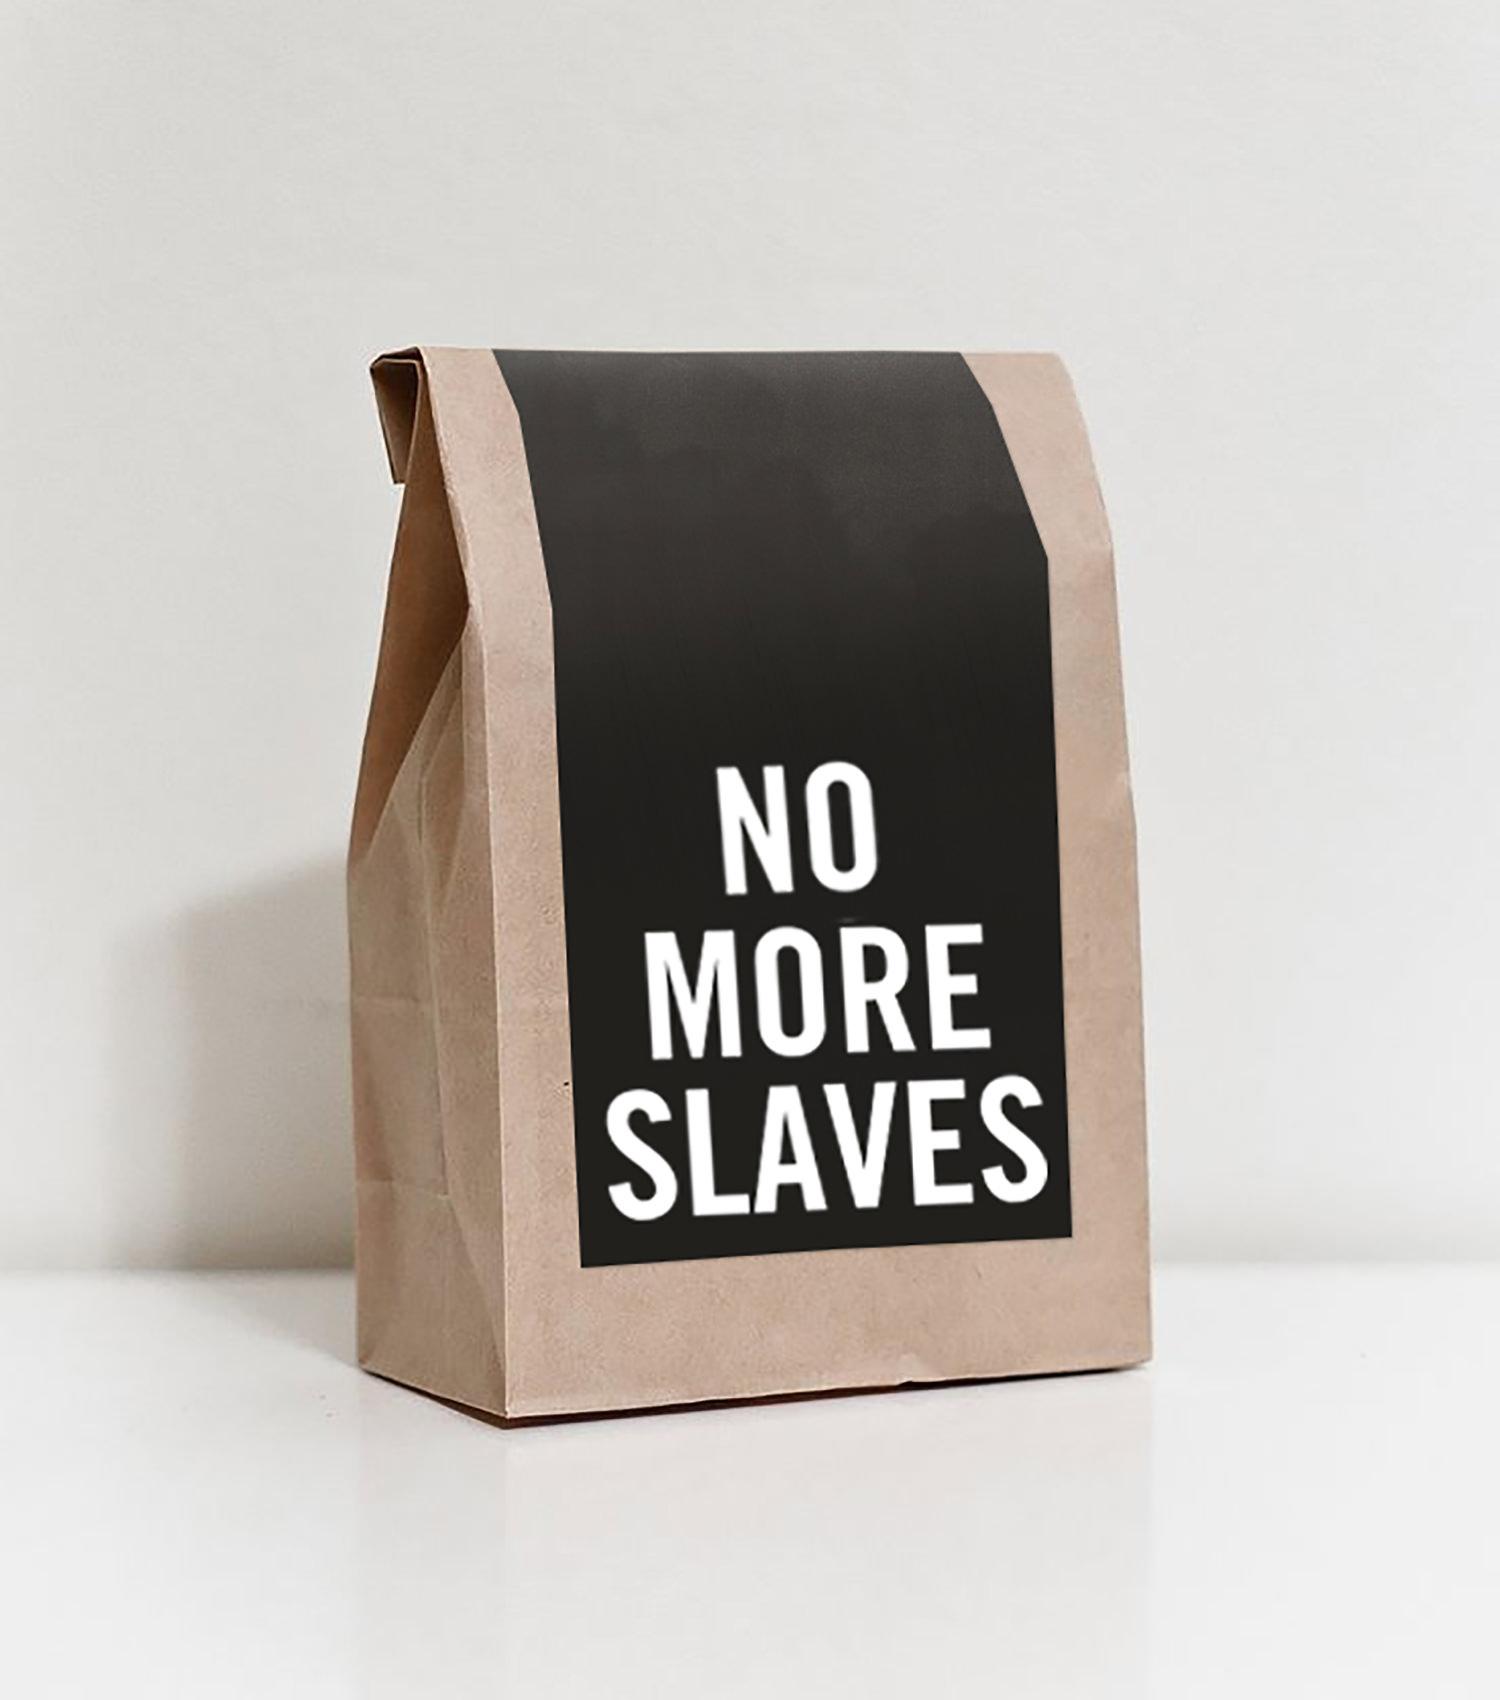 No-More-Slaves-Big-Blond-Bear-Branding-21.jpg